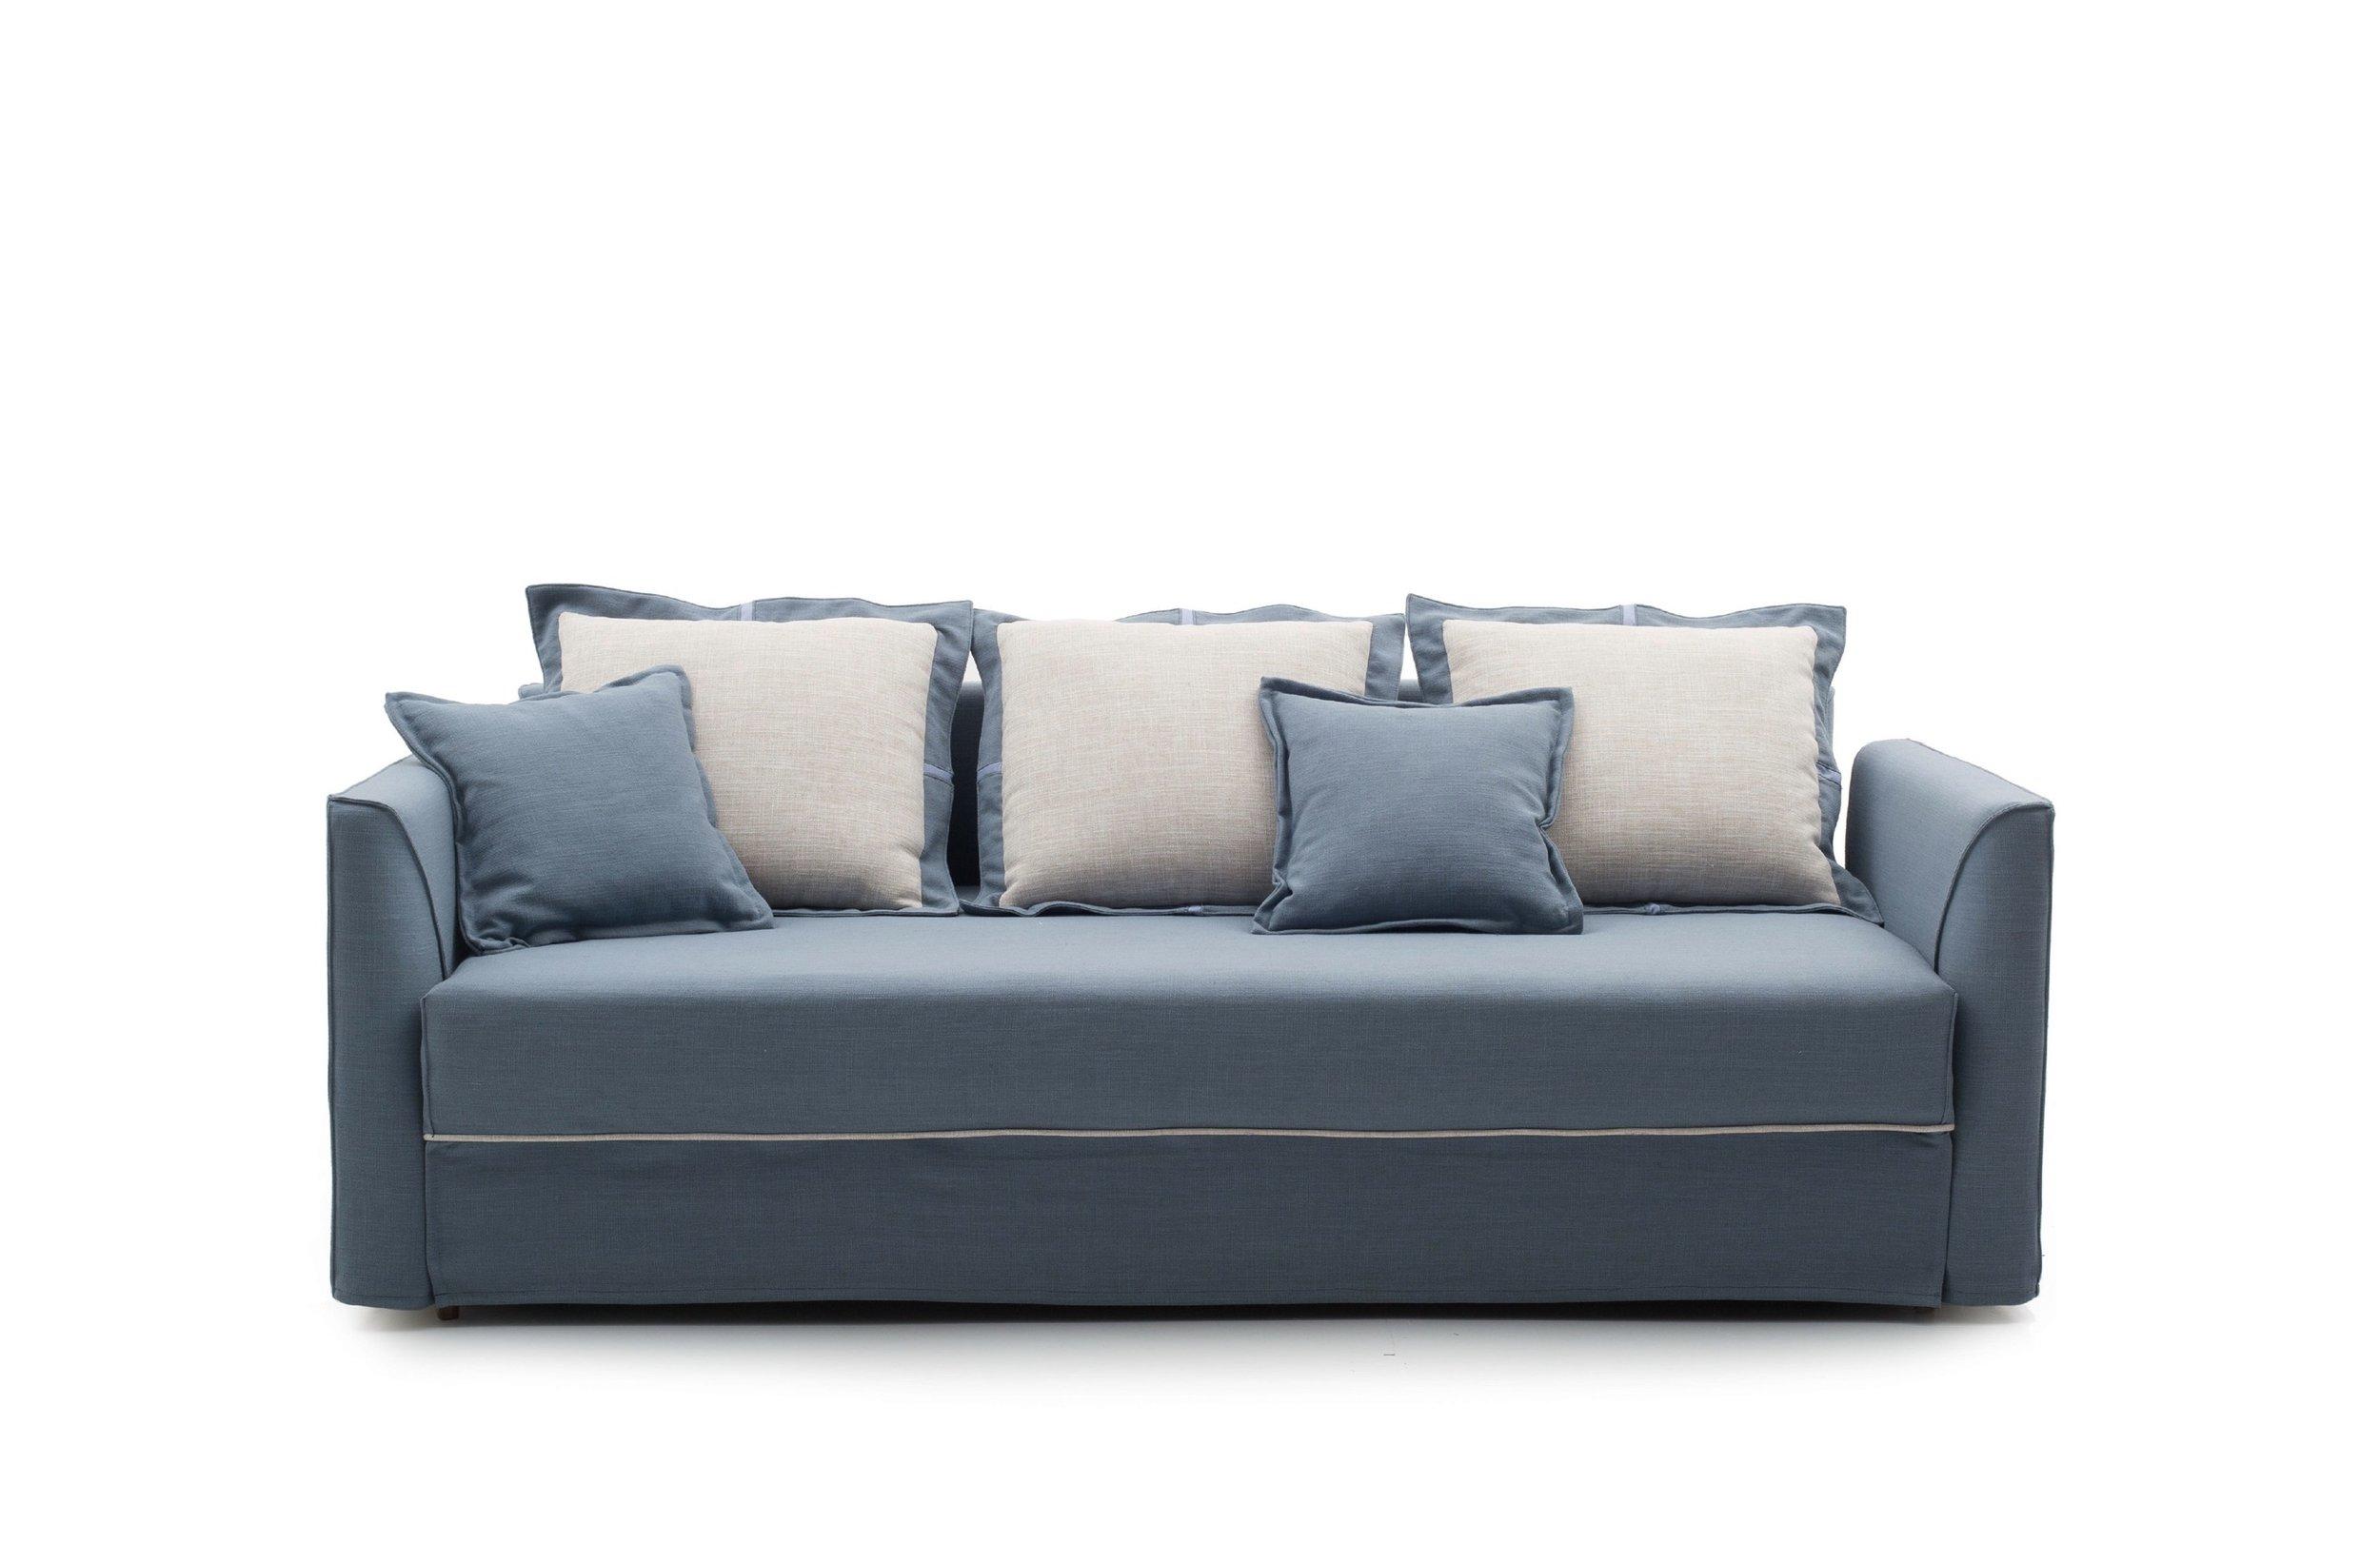 SBD 120 Modern Sofa Bed